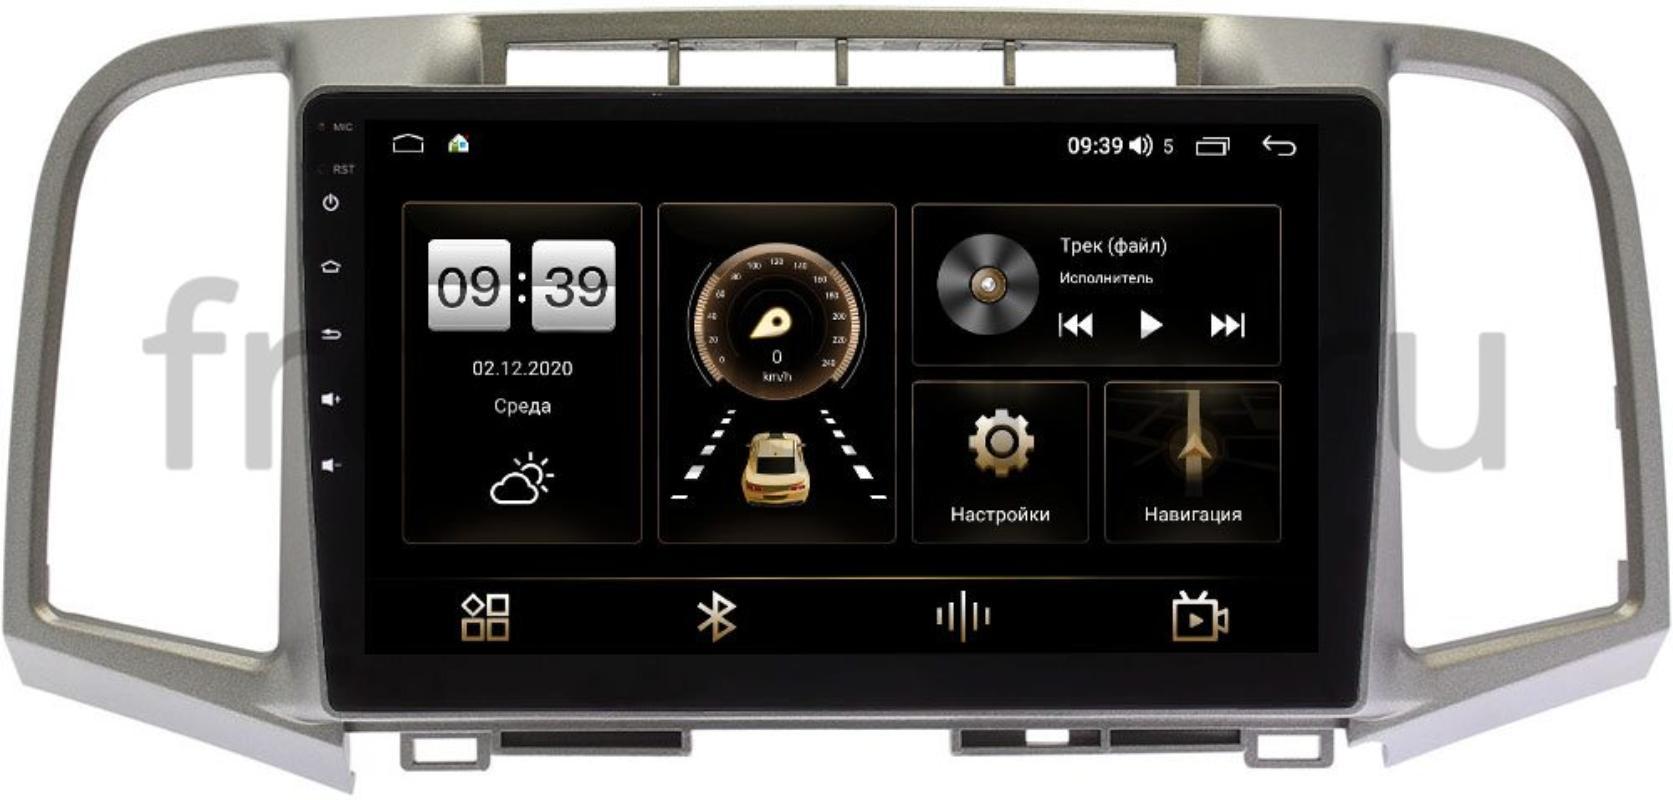 Штатная магнитола Toyota Venza 2009-2017 (без JBL) LeTrun 4196-9360 на Android 10 (6/128, DSP, QLed) С оптическим выходом (+ Камера заднего вида в подарок!)